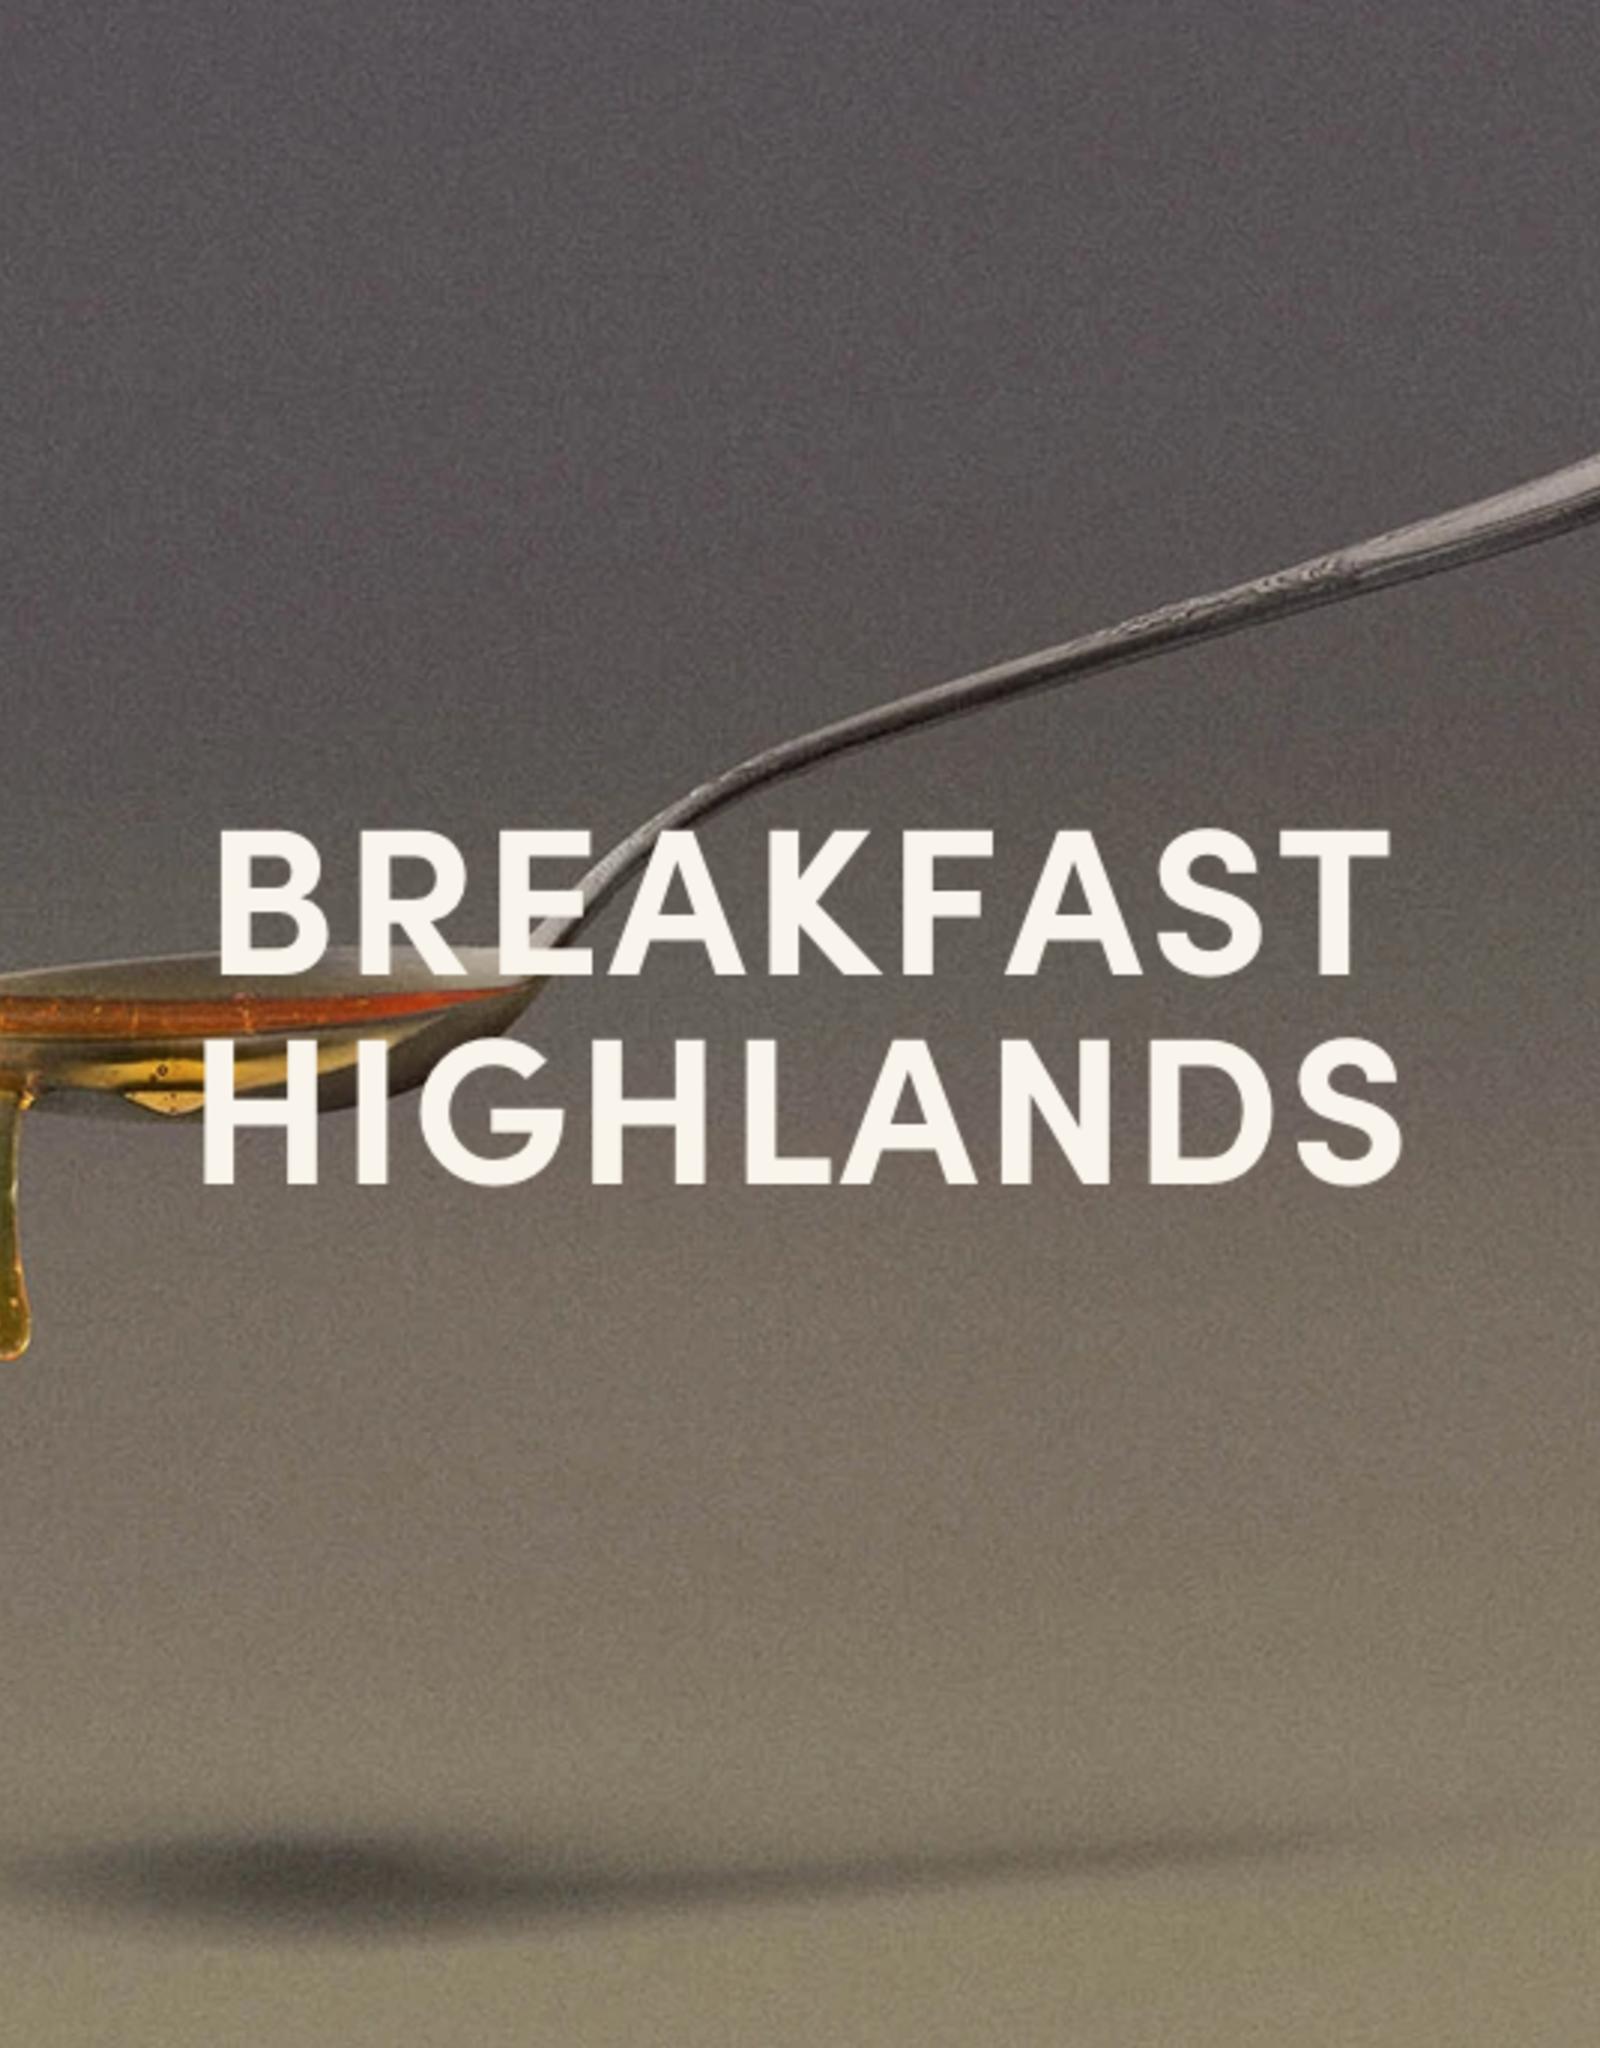 D.S. & DURGA Breakfast Highlands - Candle - 7oz